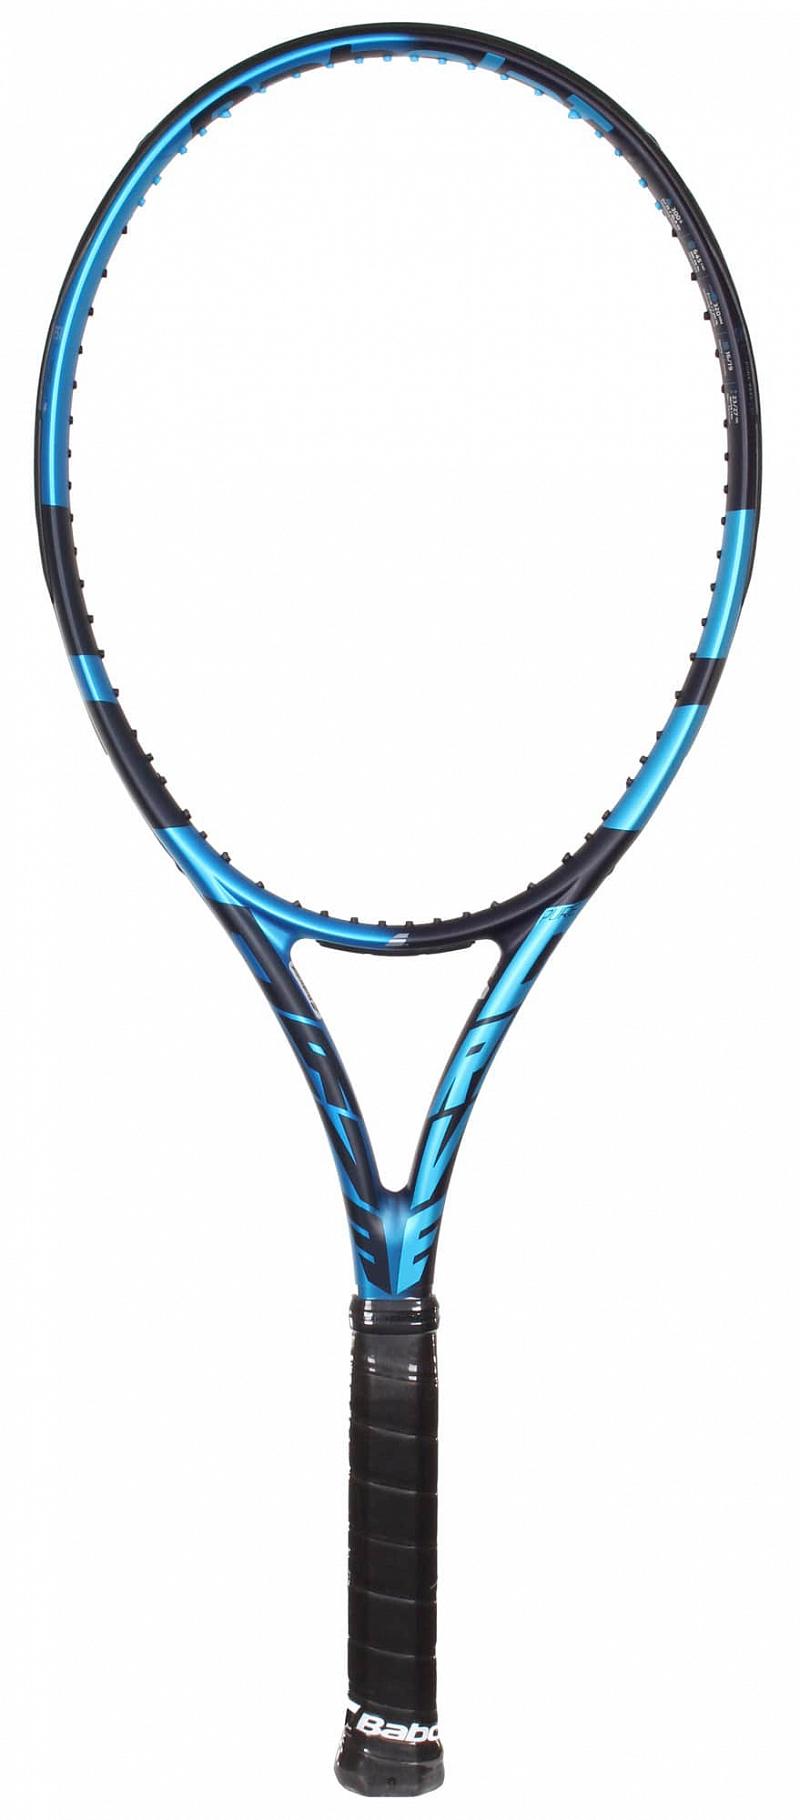 Pure Drive Team 2021 tenisová raketa grip: G2